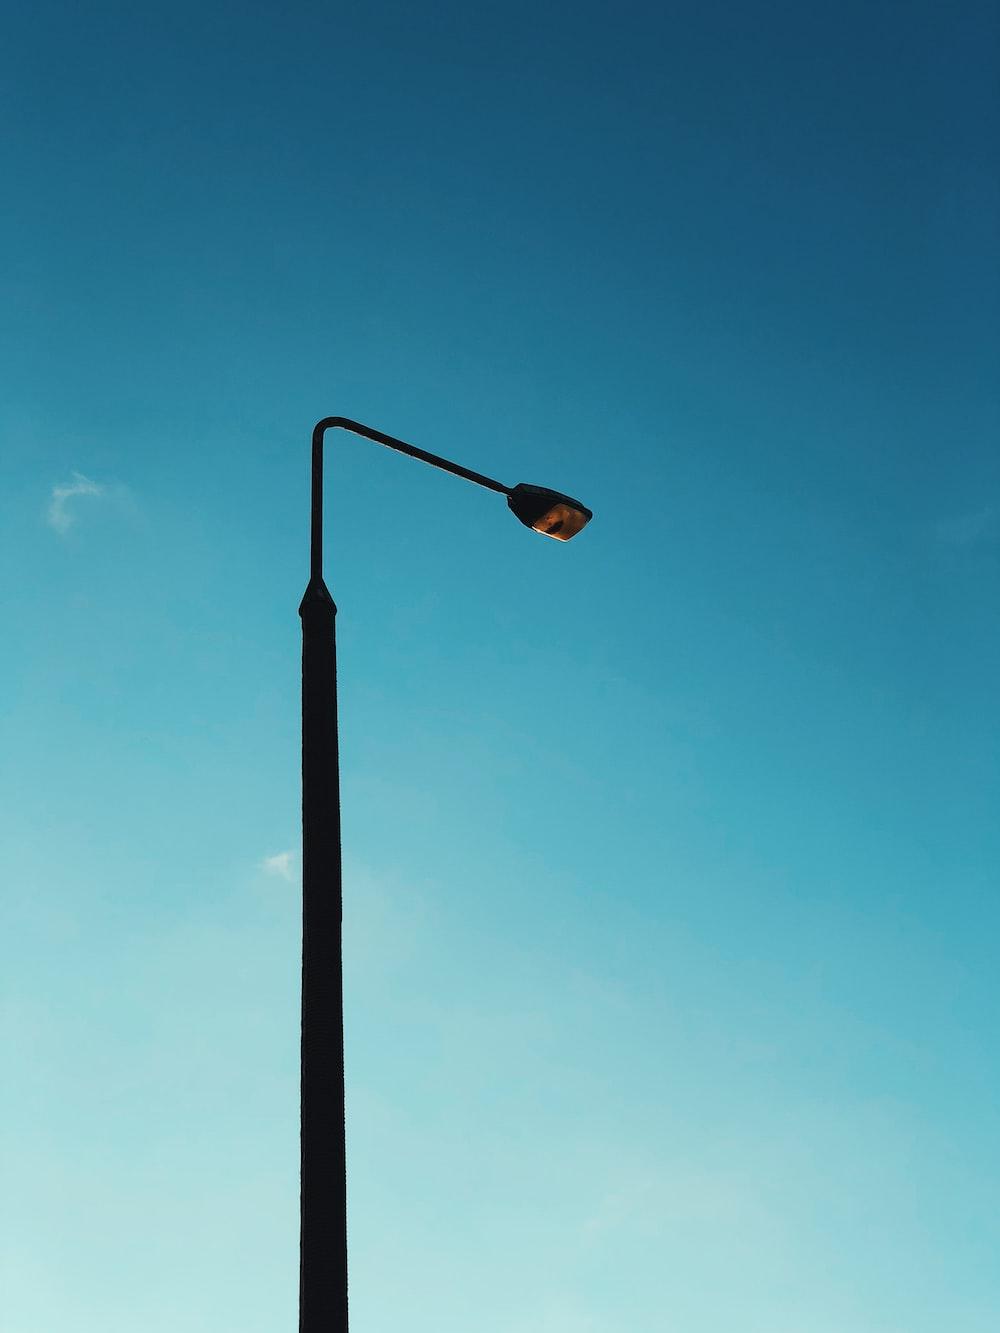 turned-off light post